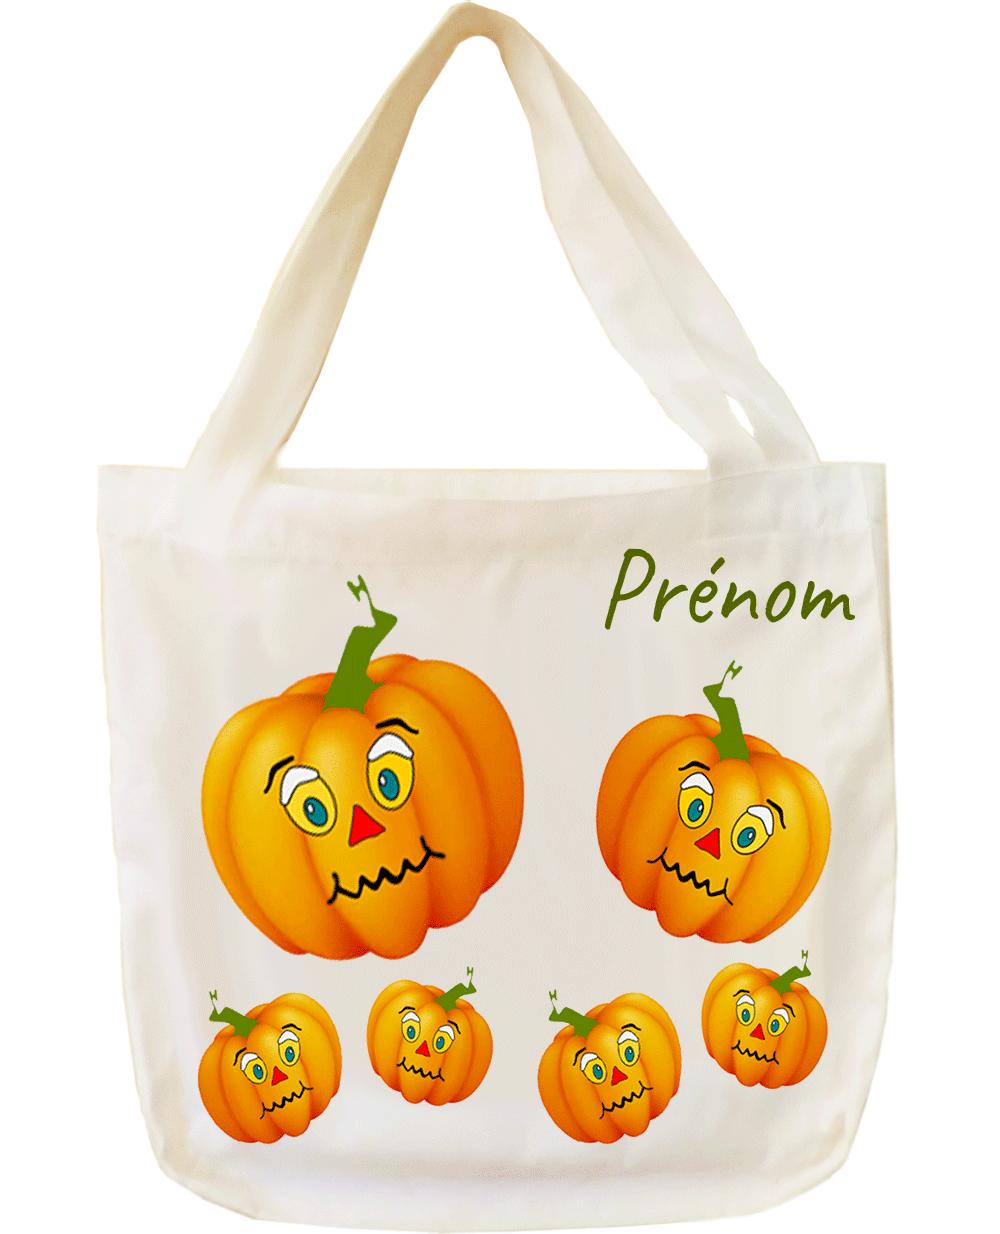 tote-bag;sac;cabas;texti;cadeaux;personnalisable;personnalisation;personnalise;prenom;legume;citrouille;halloween